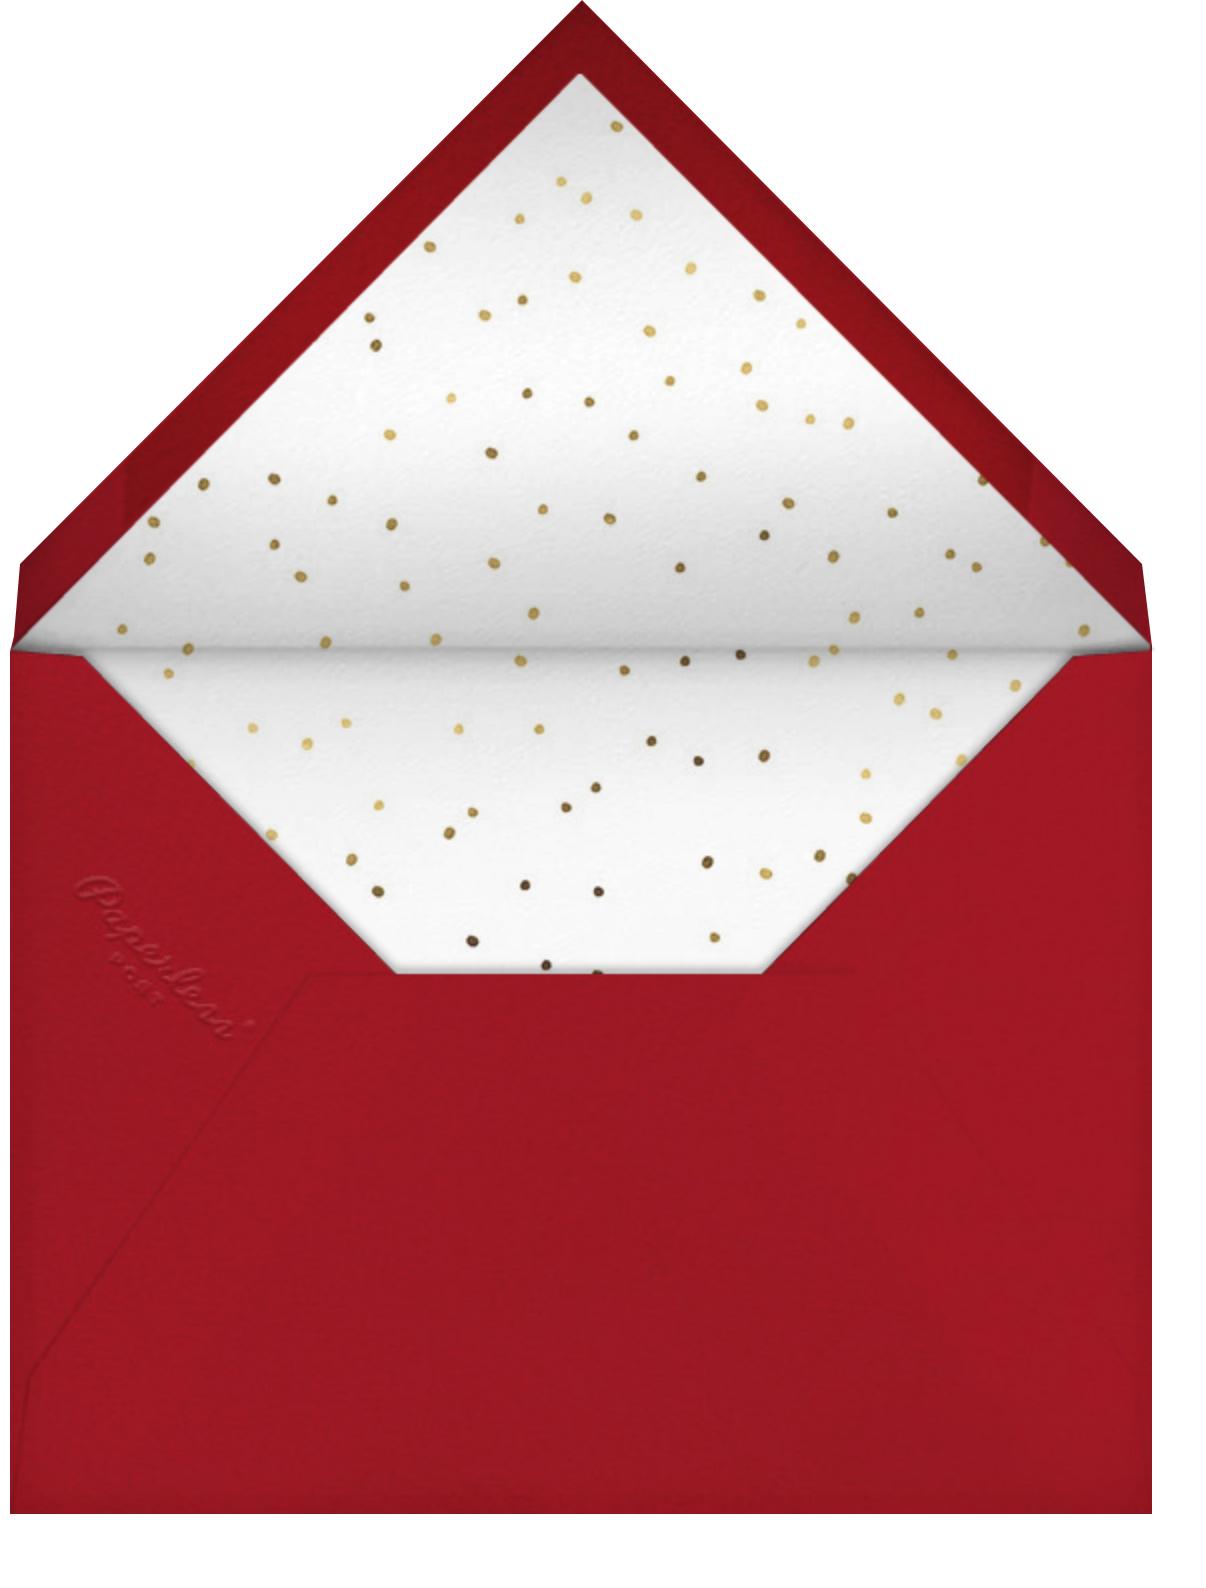 Neat Knit - kate spade new york - Christmas - envelope back